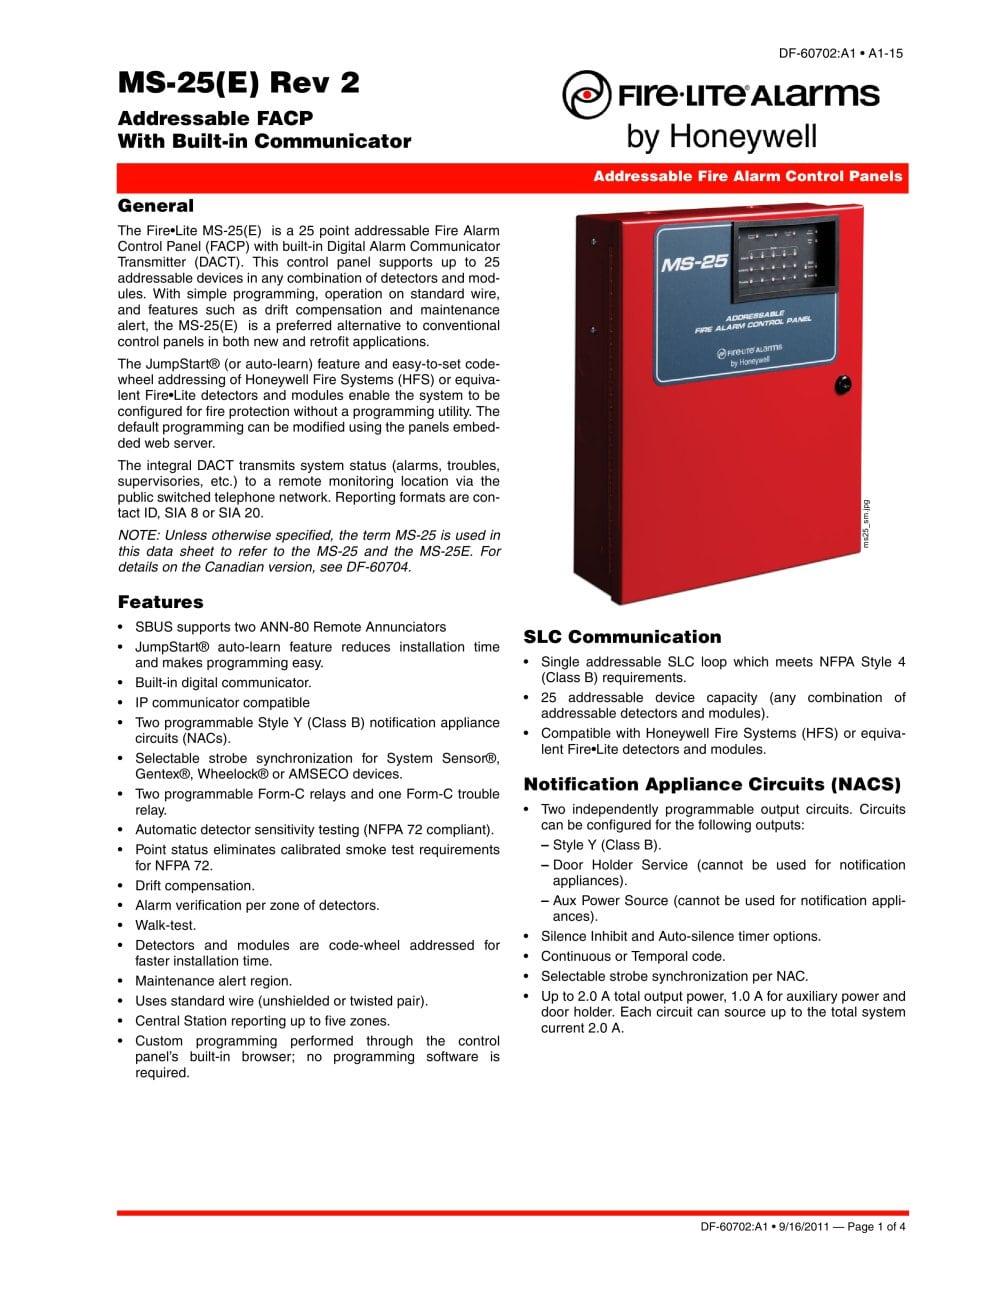 MS-25 - Fire-Lite Alarms - PDF Catalogue | Technical Documentation ...